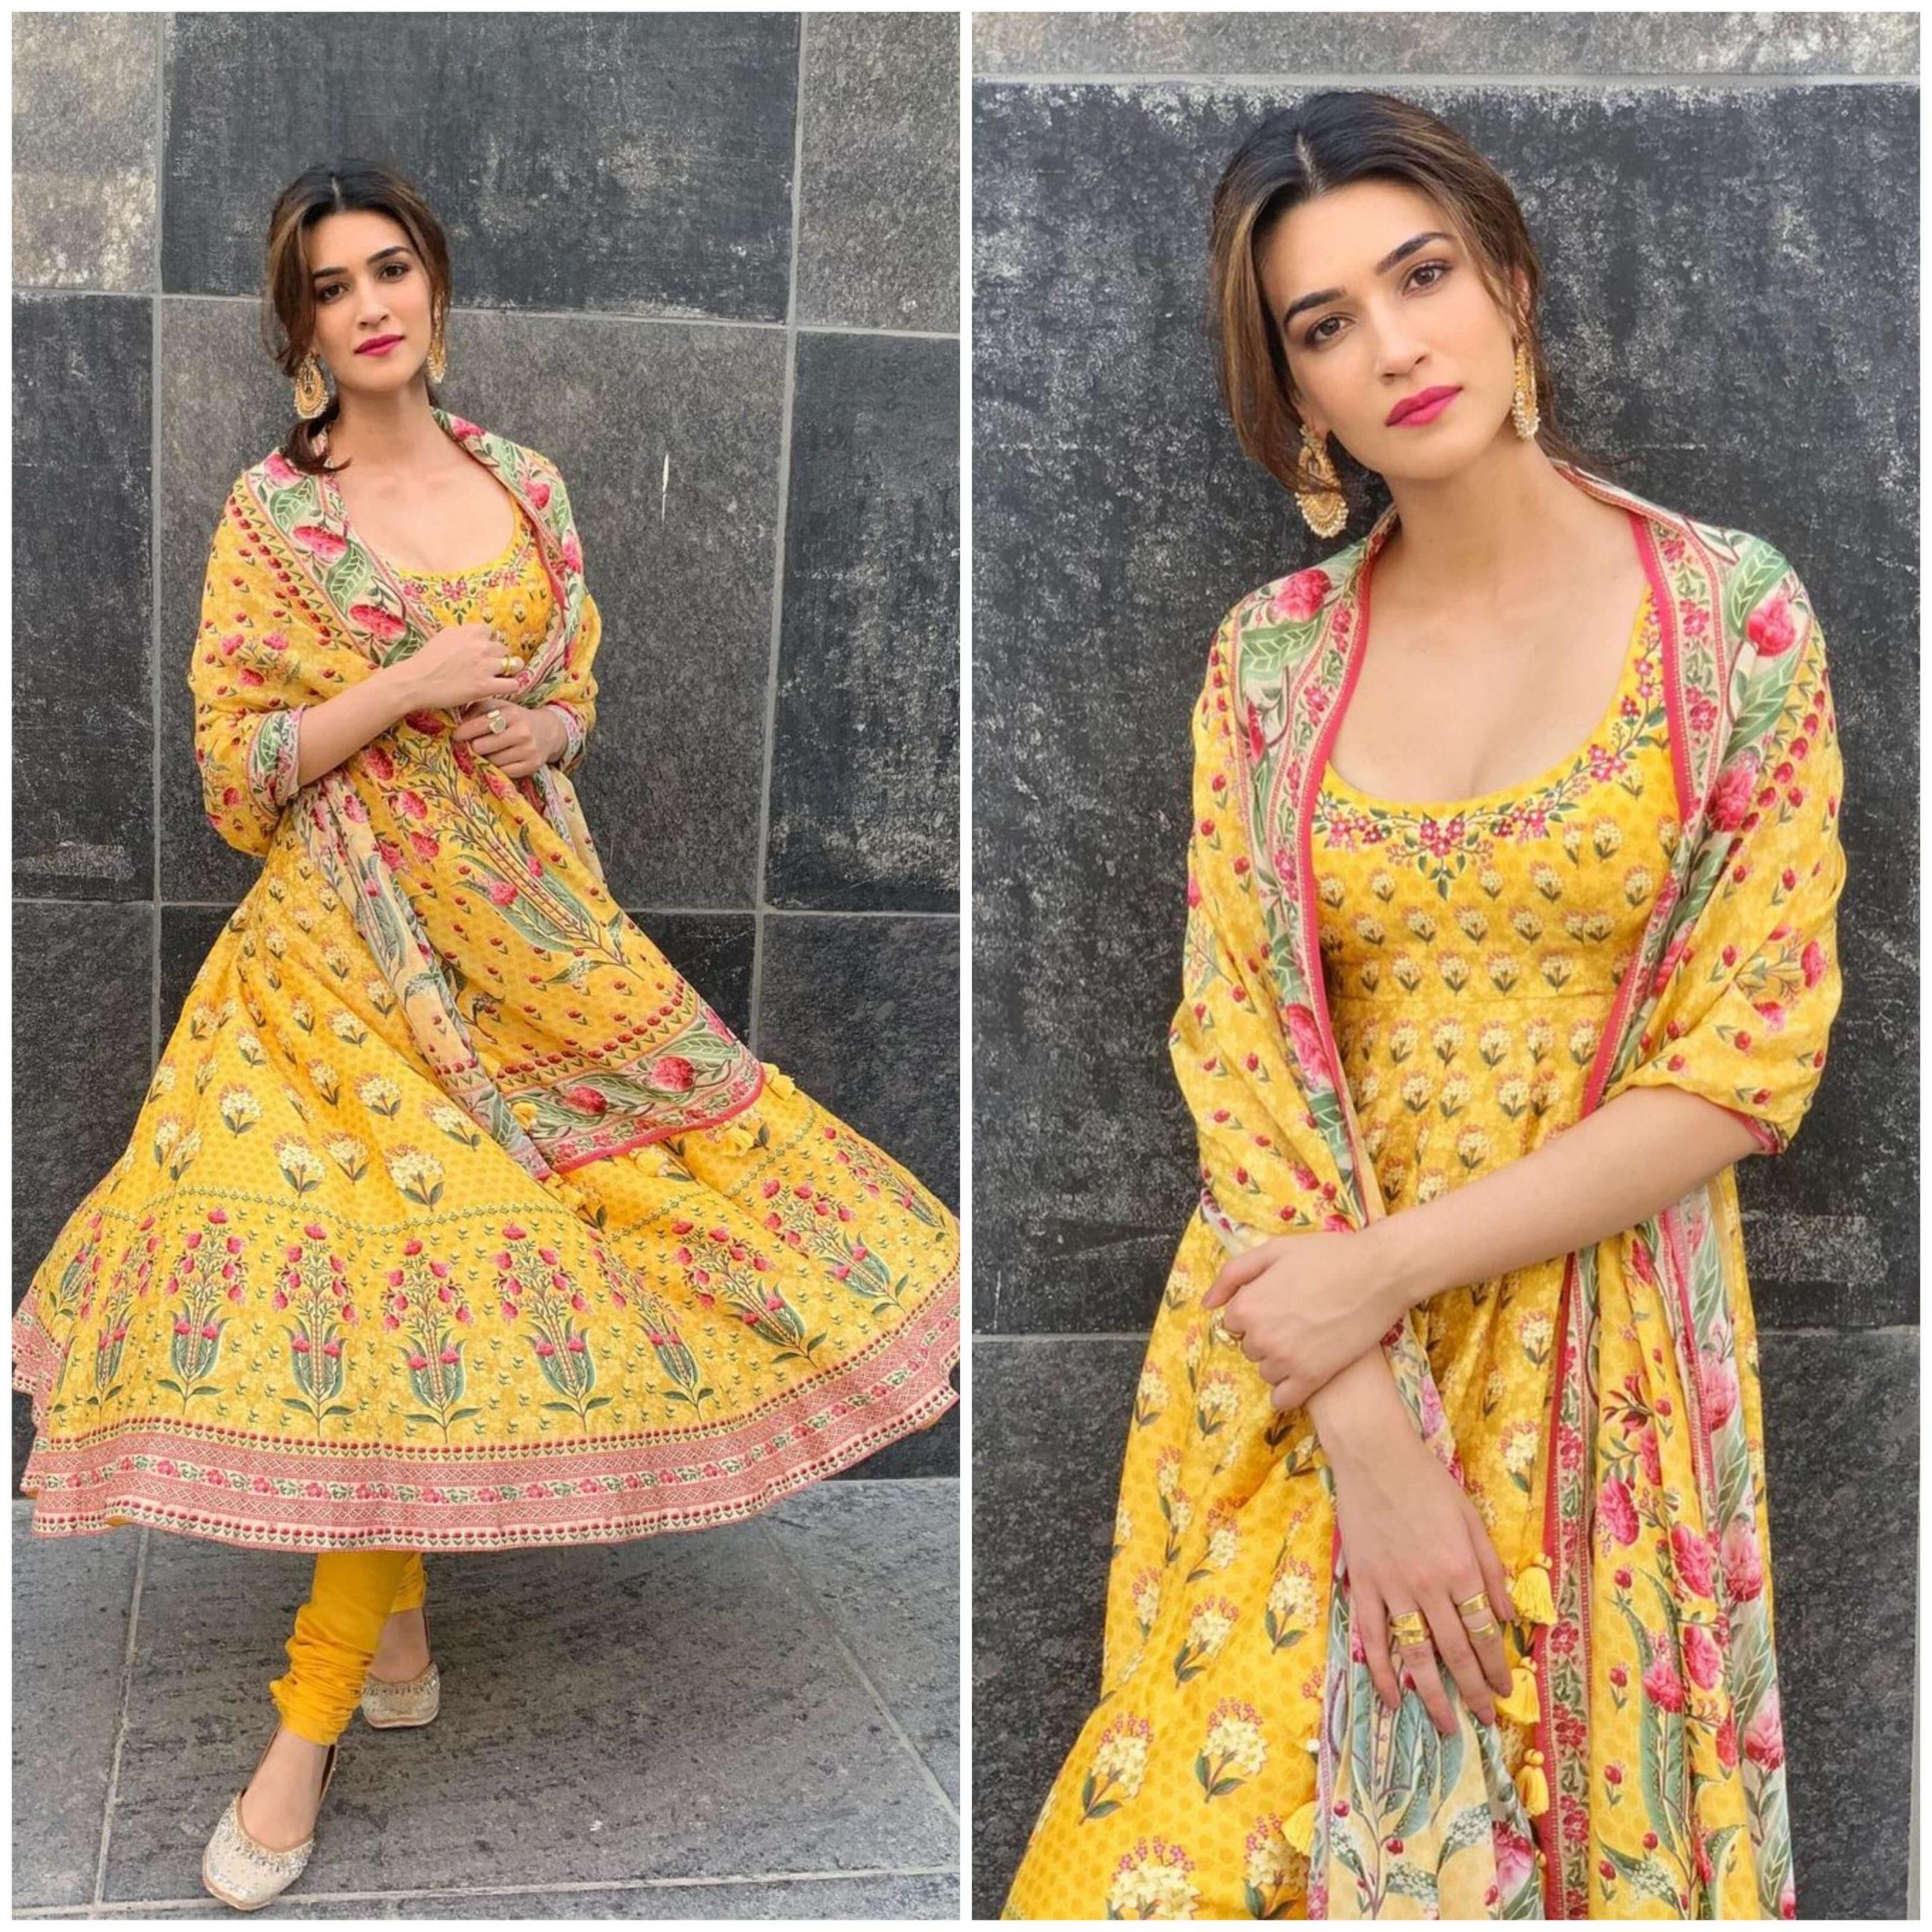 Kriti Sanon beautiful Yellow Floral Print Designer Dress